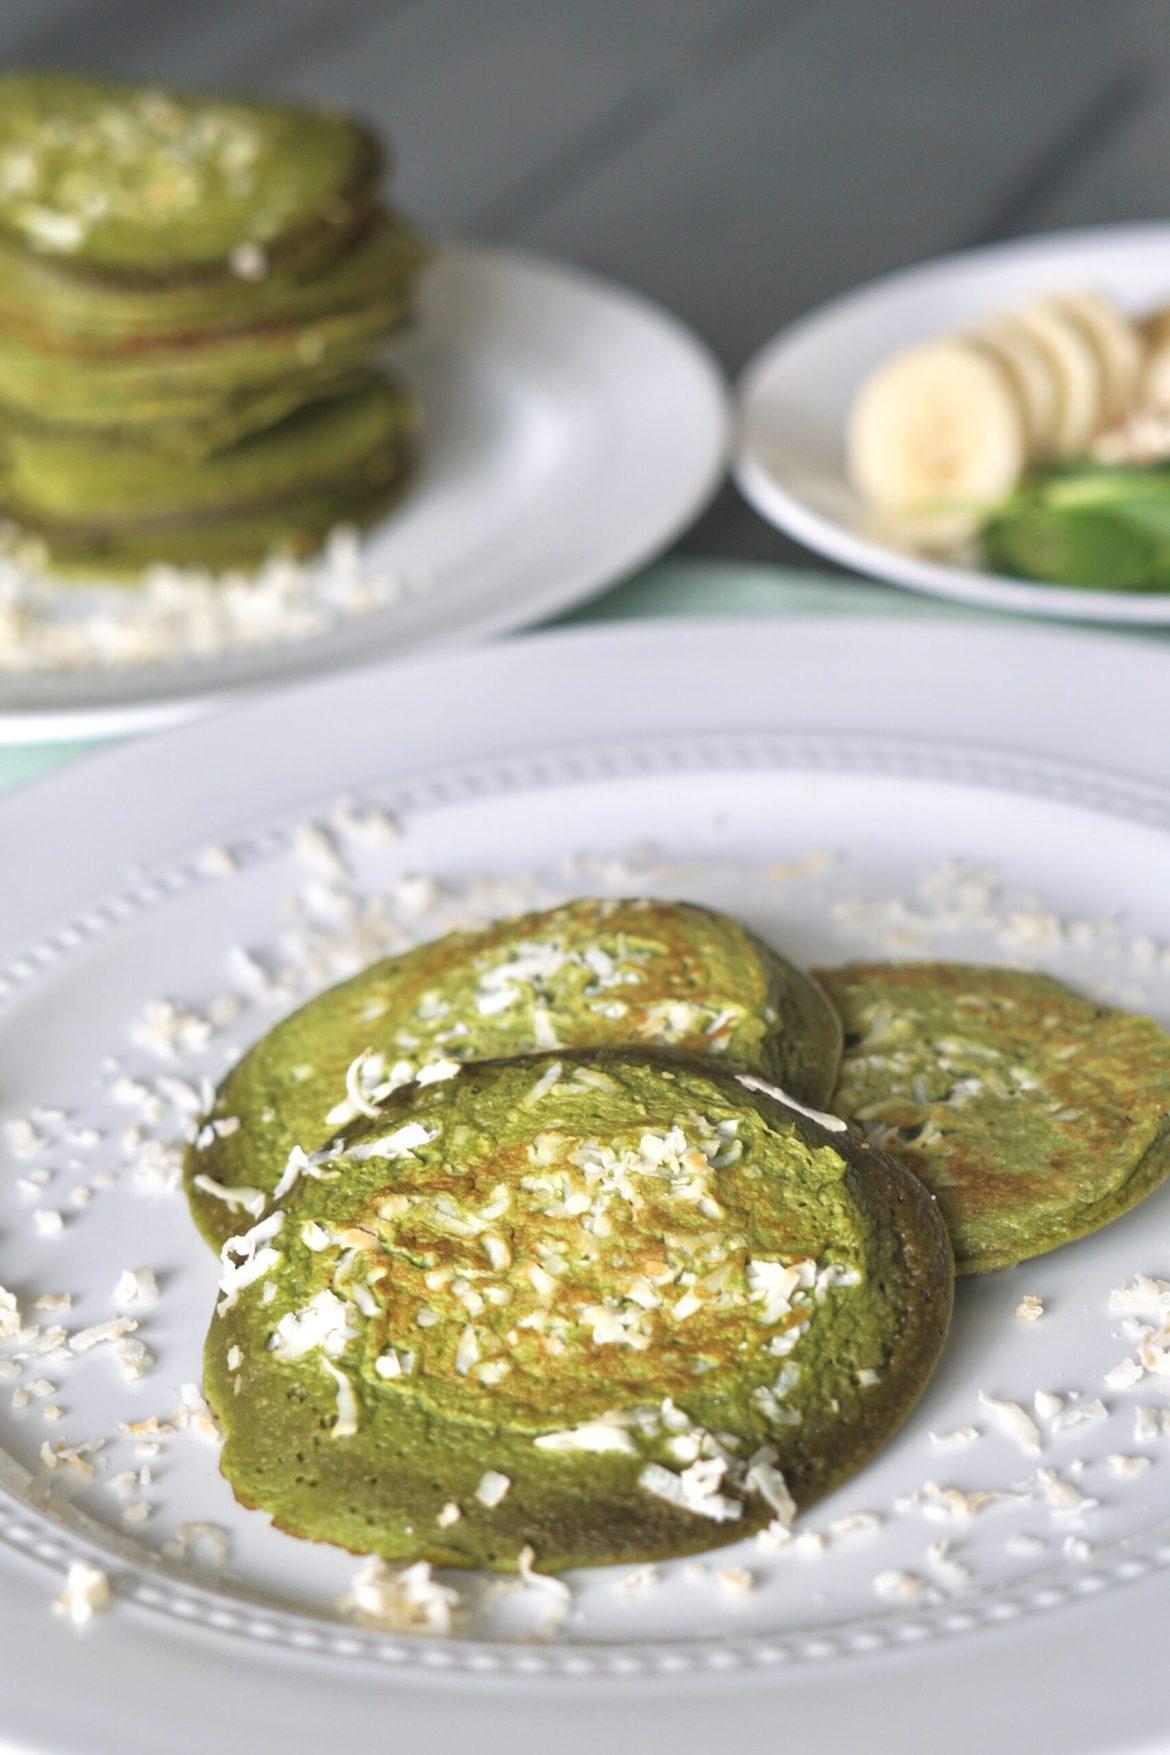 healthy breakfast recipes, egg recipes, spinach breakfast recipe, healthy green protein pancakes, deidra mangus, shredded coconut, banana recipes, clean eating recipes, weight loss recipes, successful beachbody coach